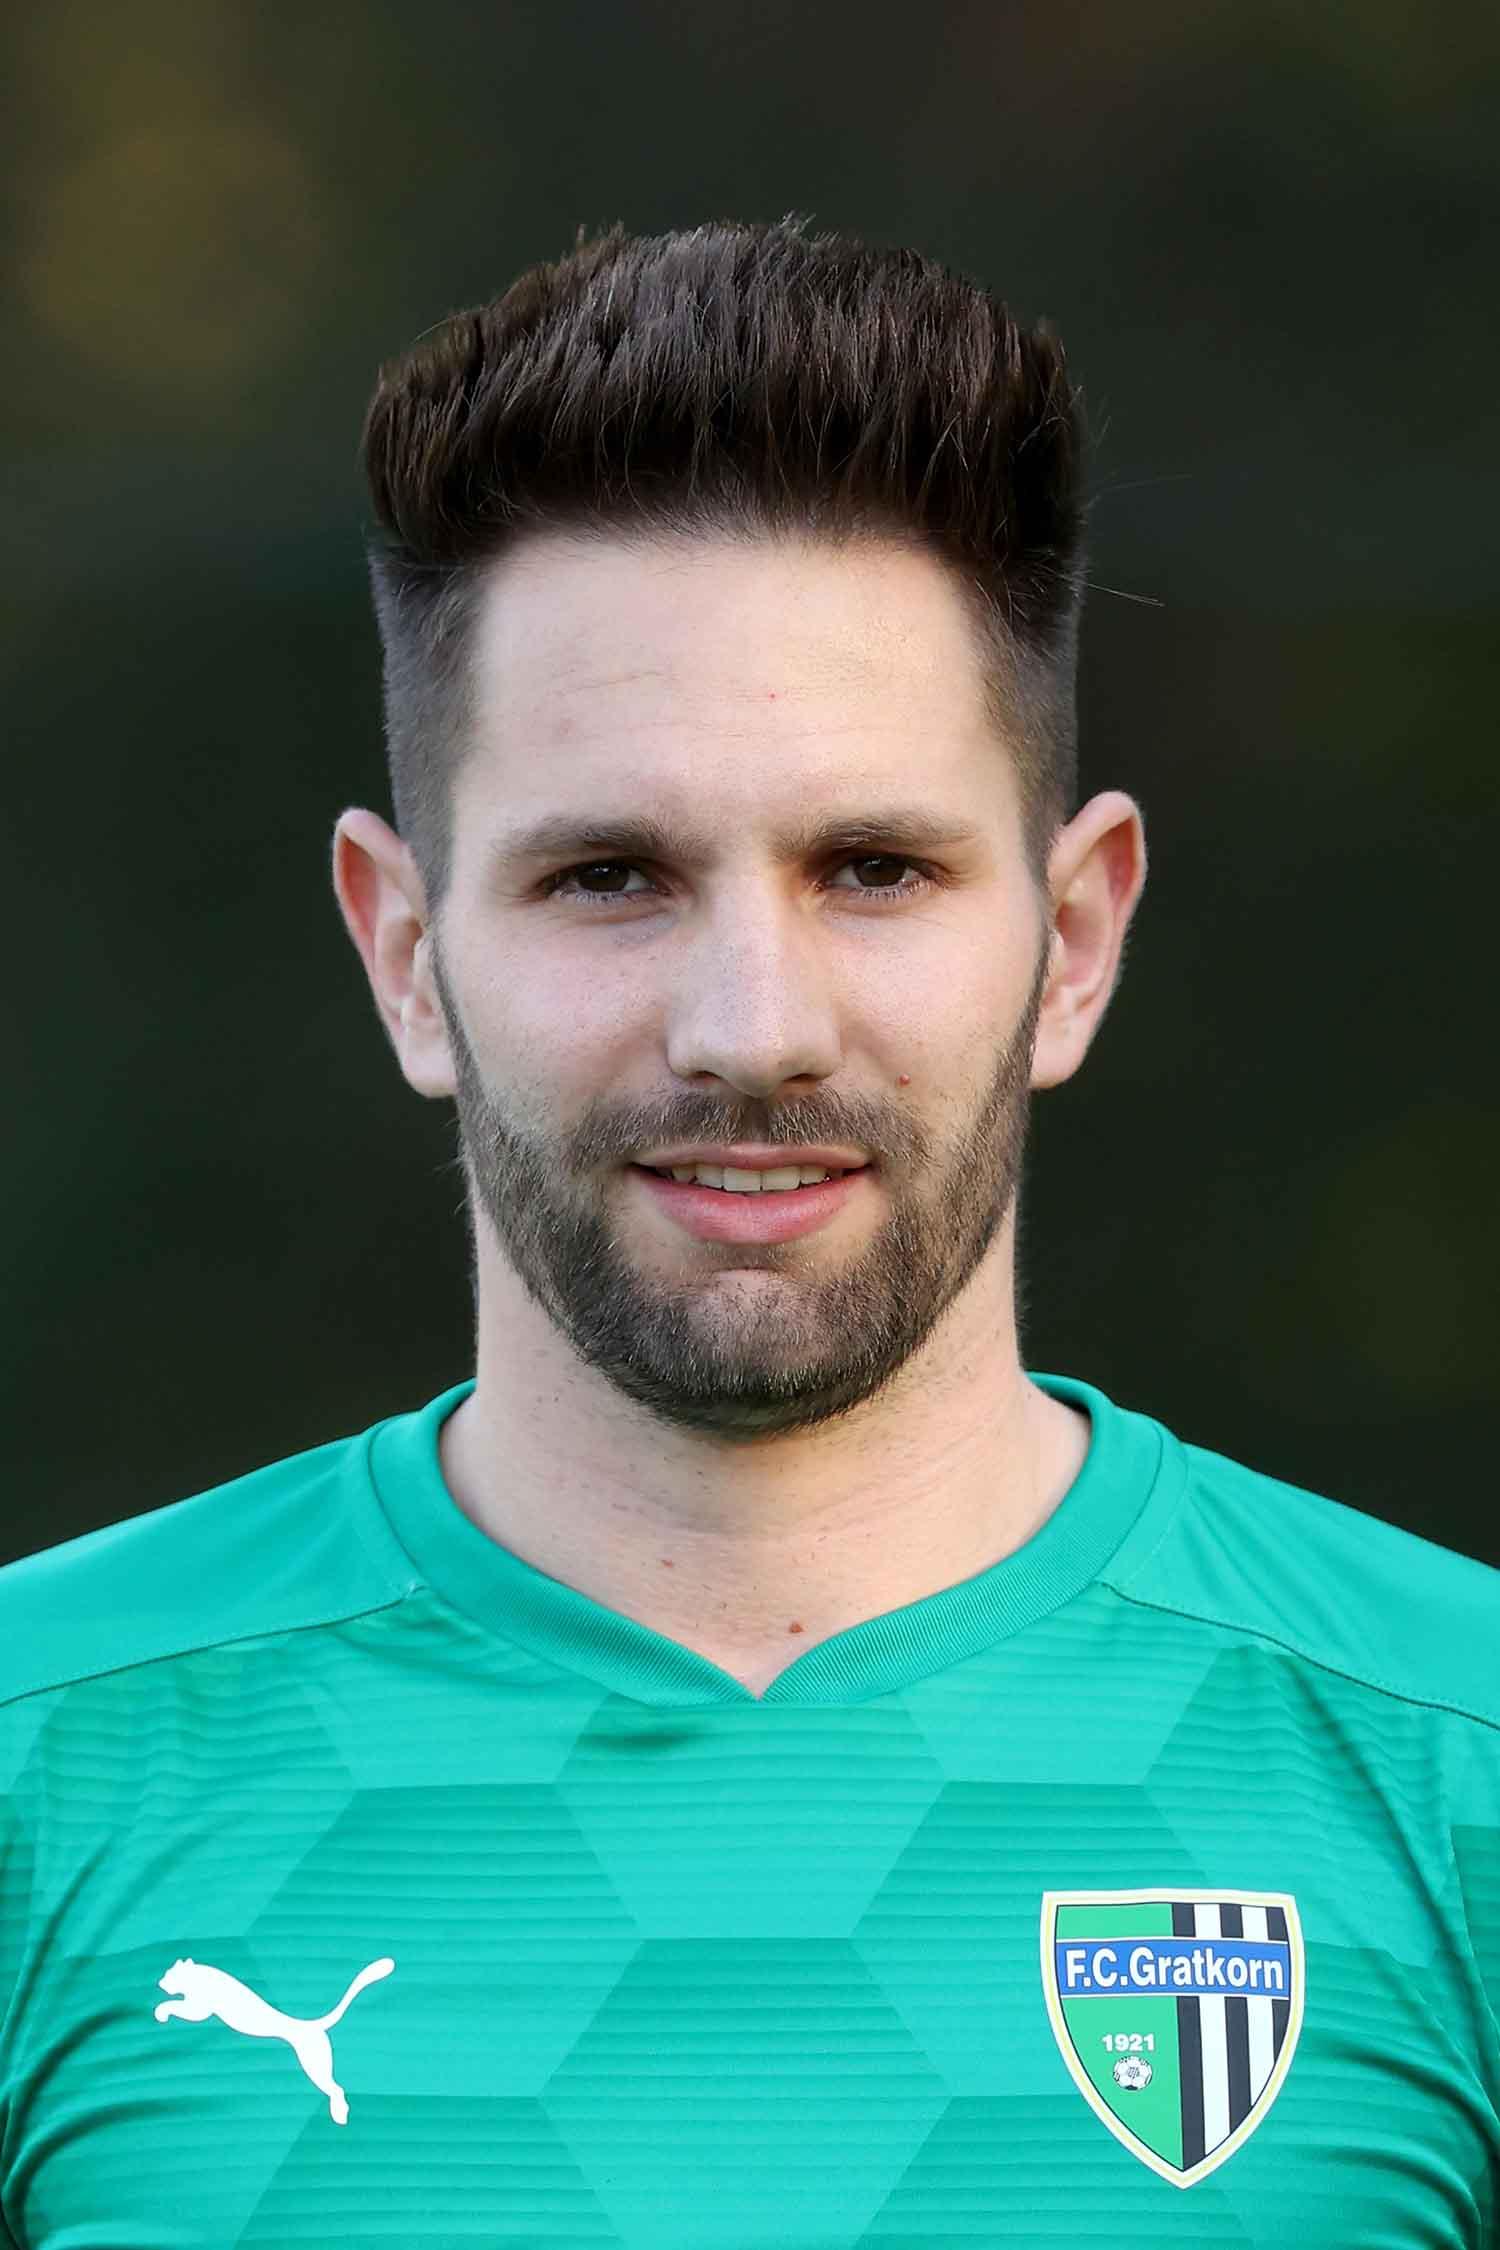 Patrick Mitteregger, Sturm FC Gratkorn